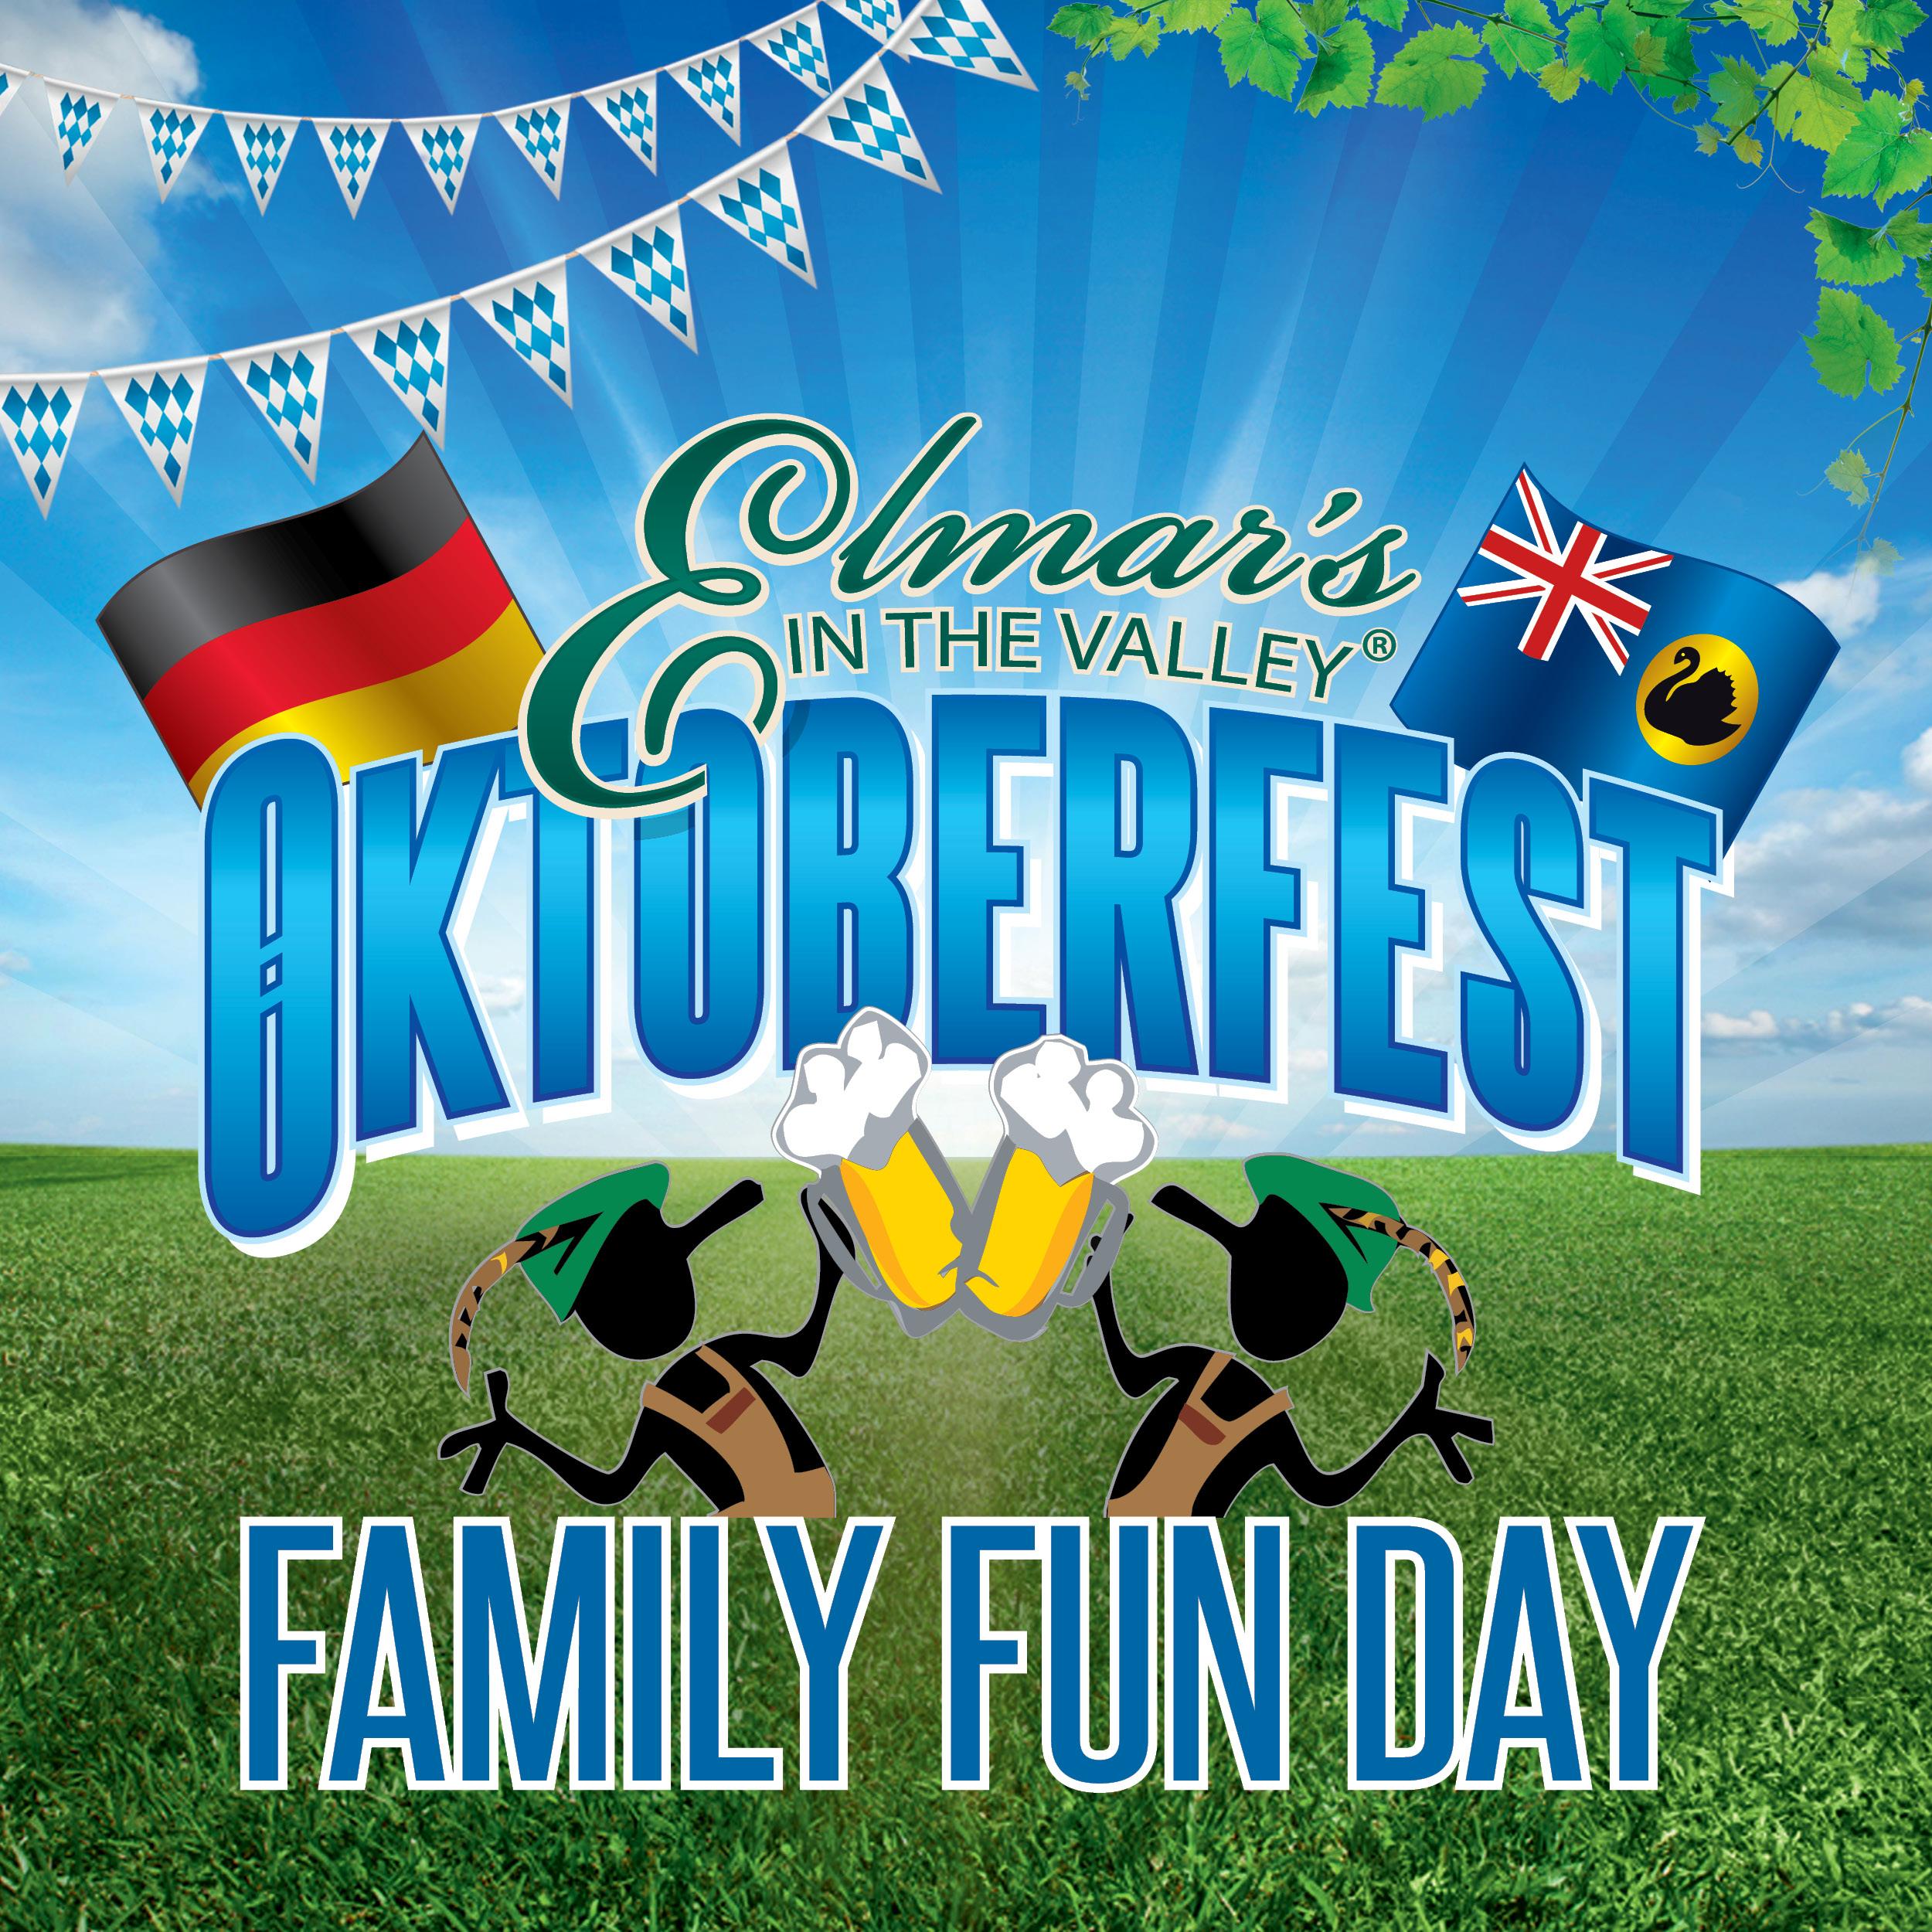 Elmar's in the Valley OKTOBERFEST Family Fun Day